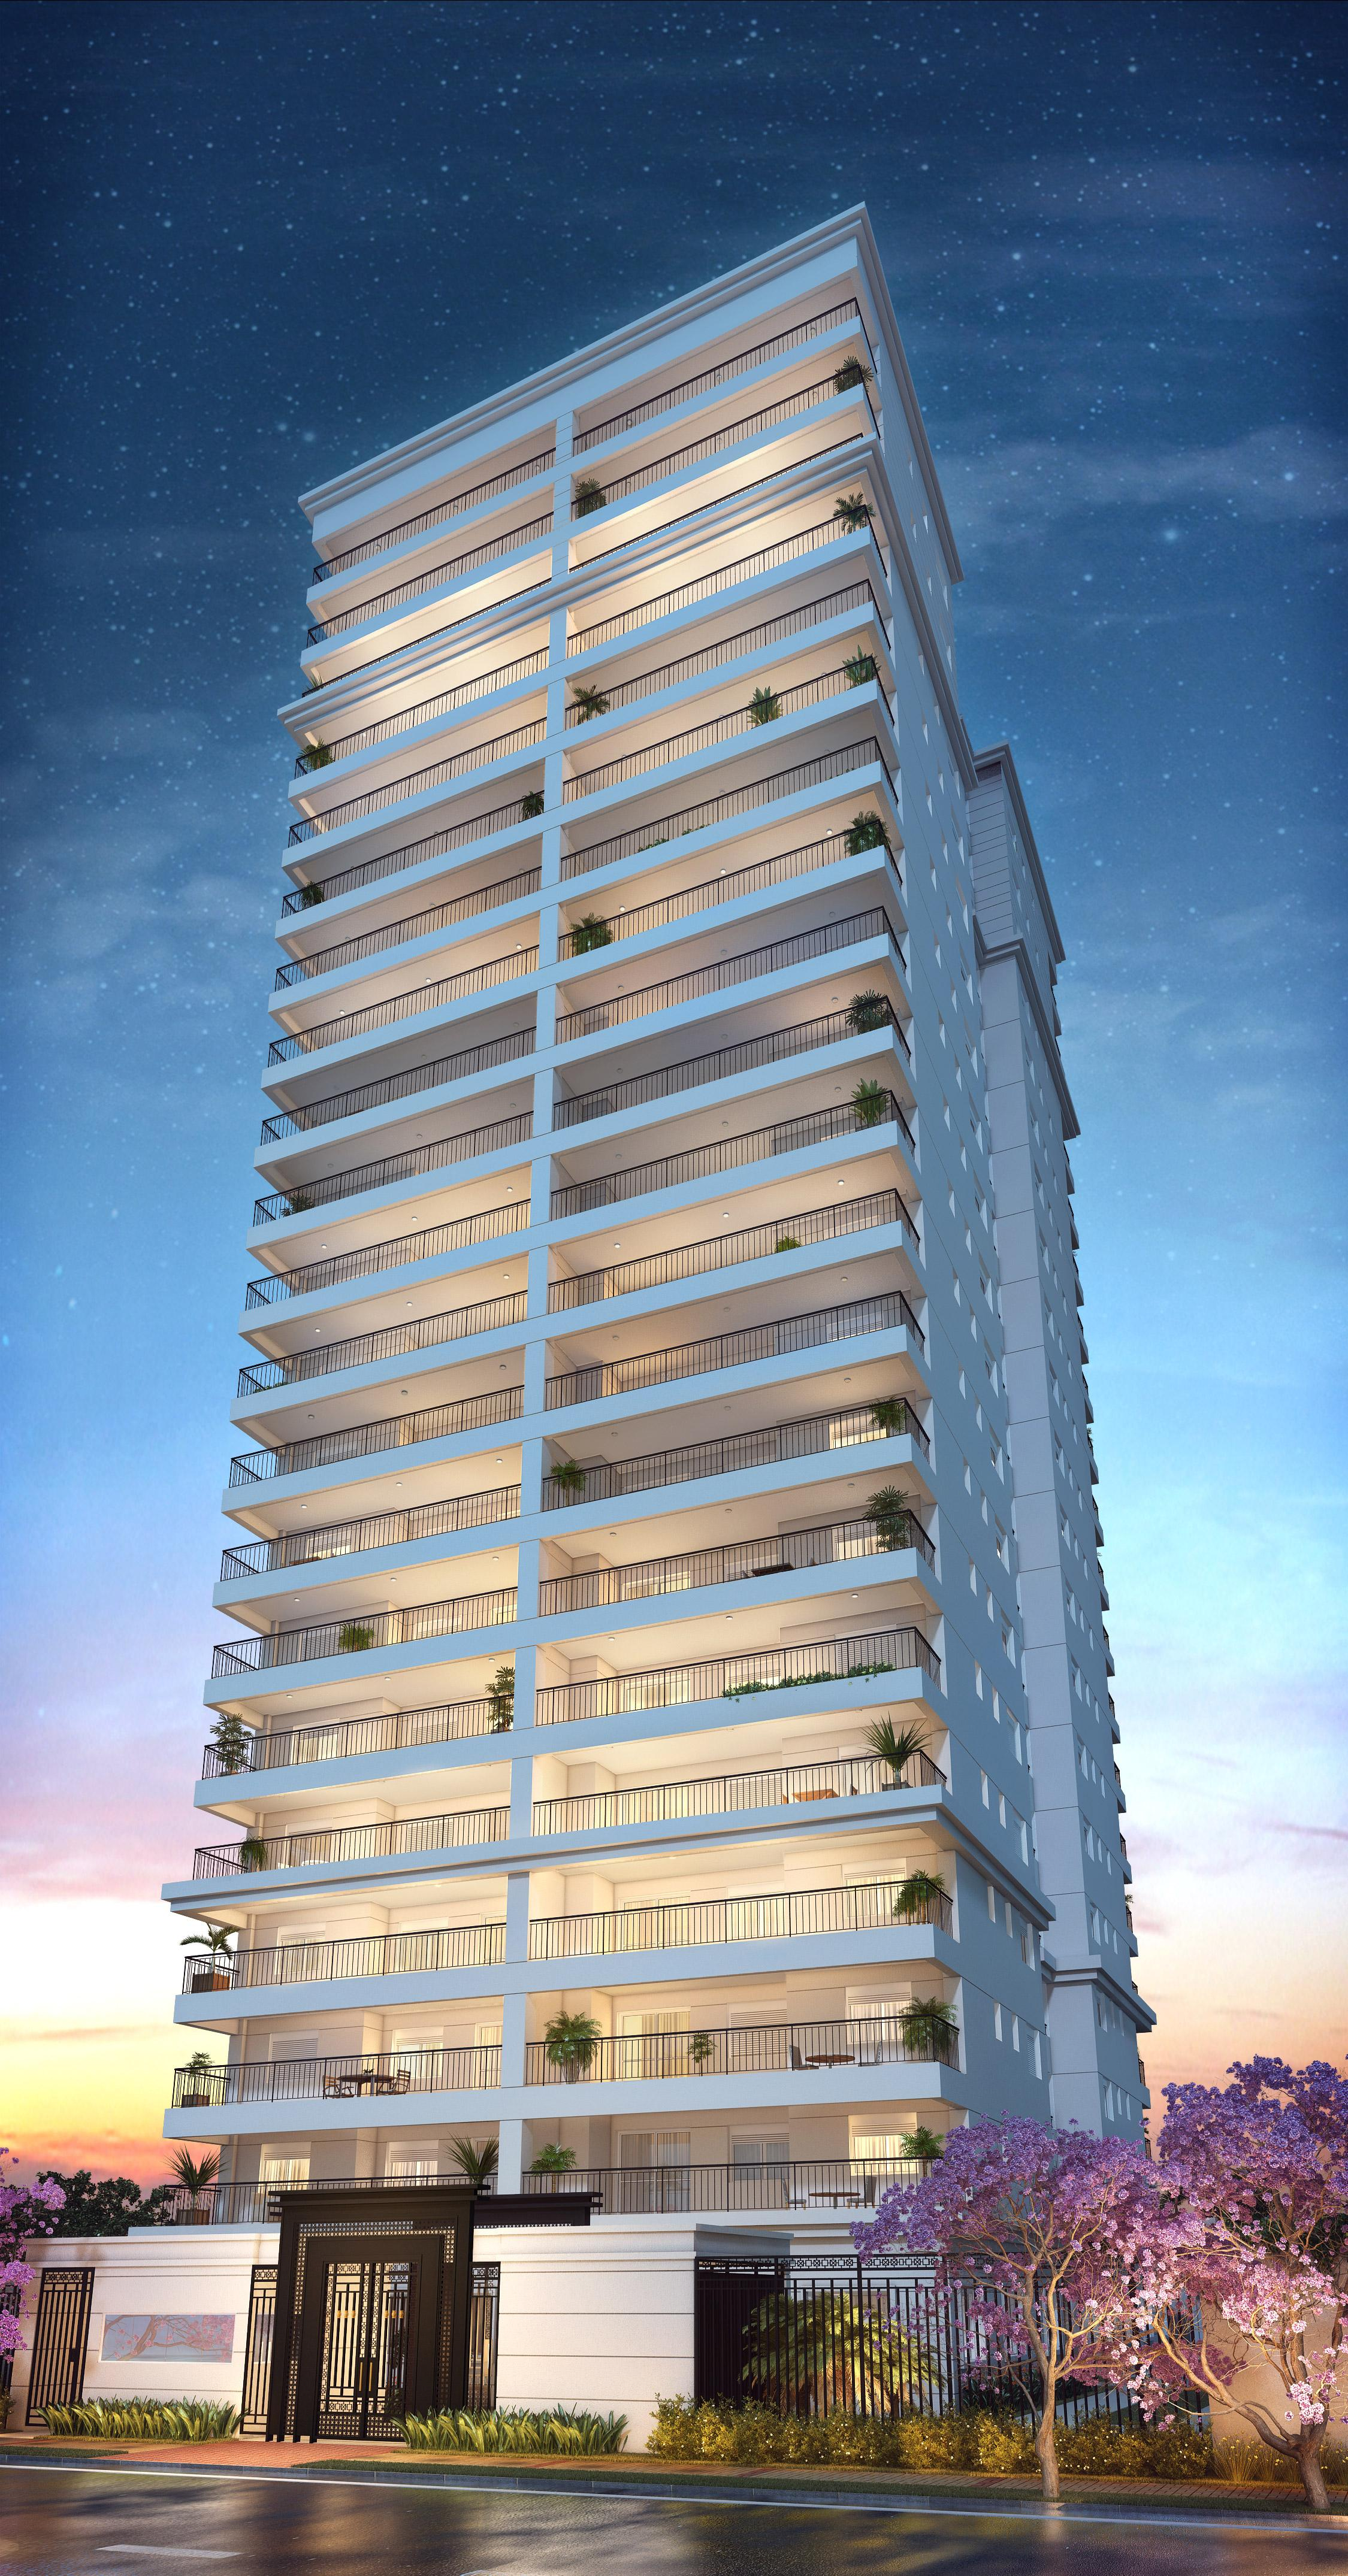 Fachada | Cyrela Gran Cypriani – Apartamentono  Ipiranga - São Paulo - São Paulo